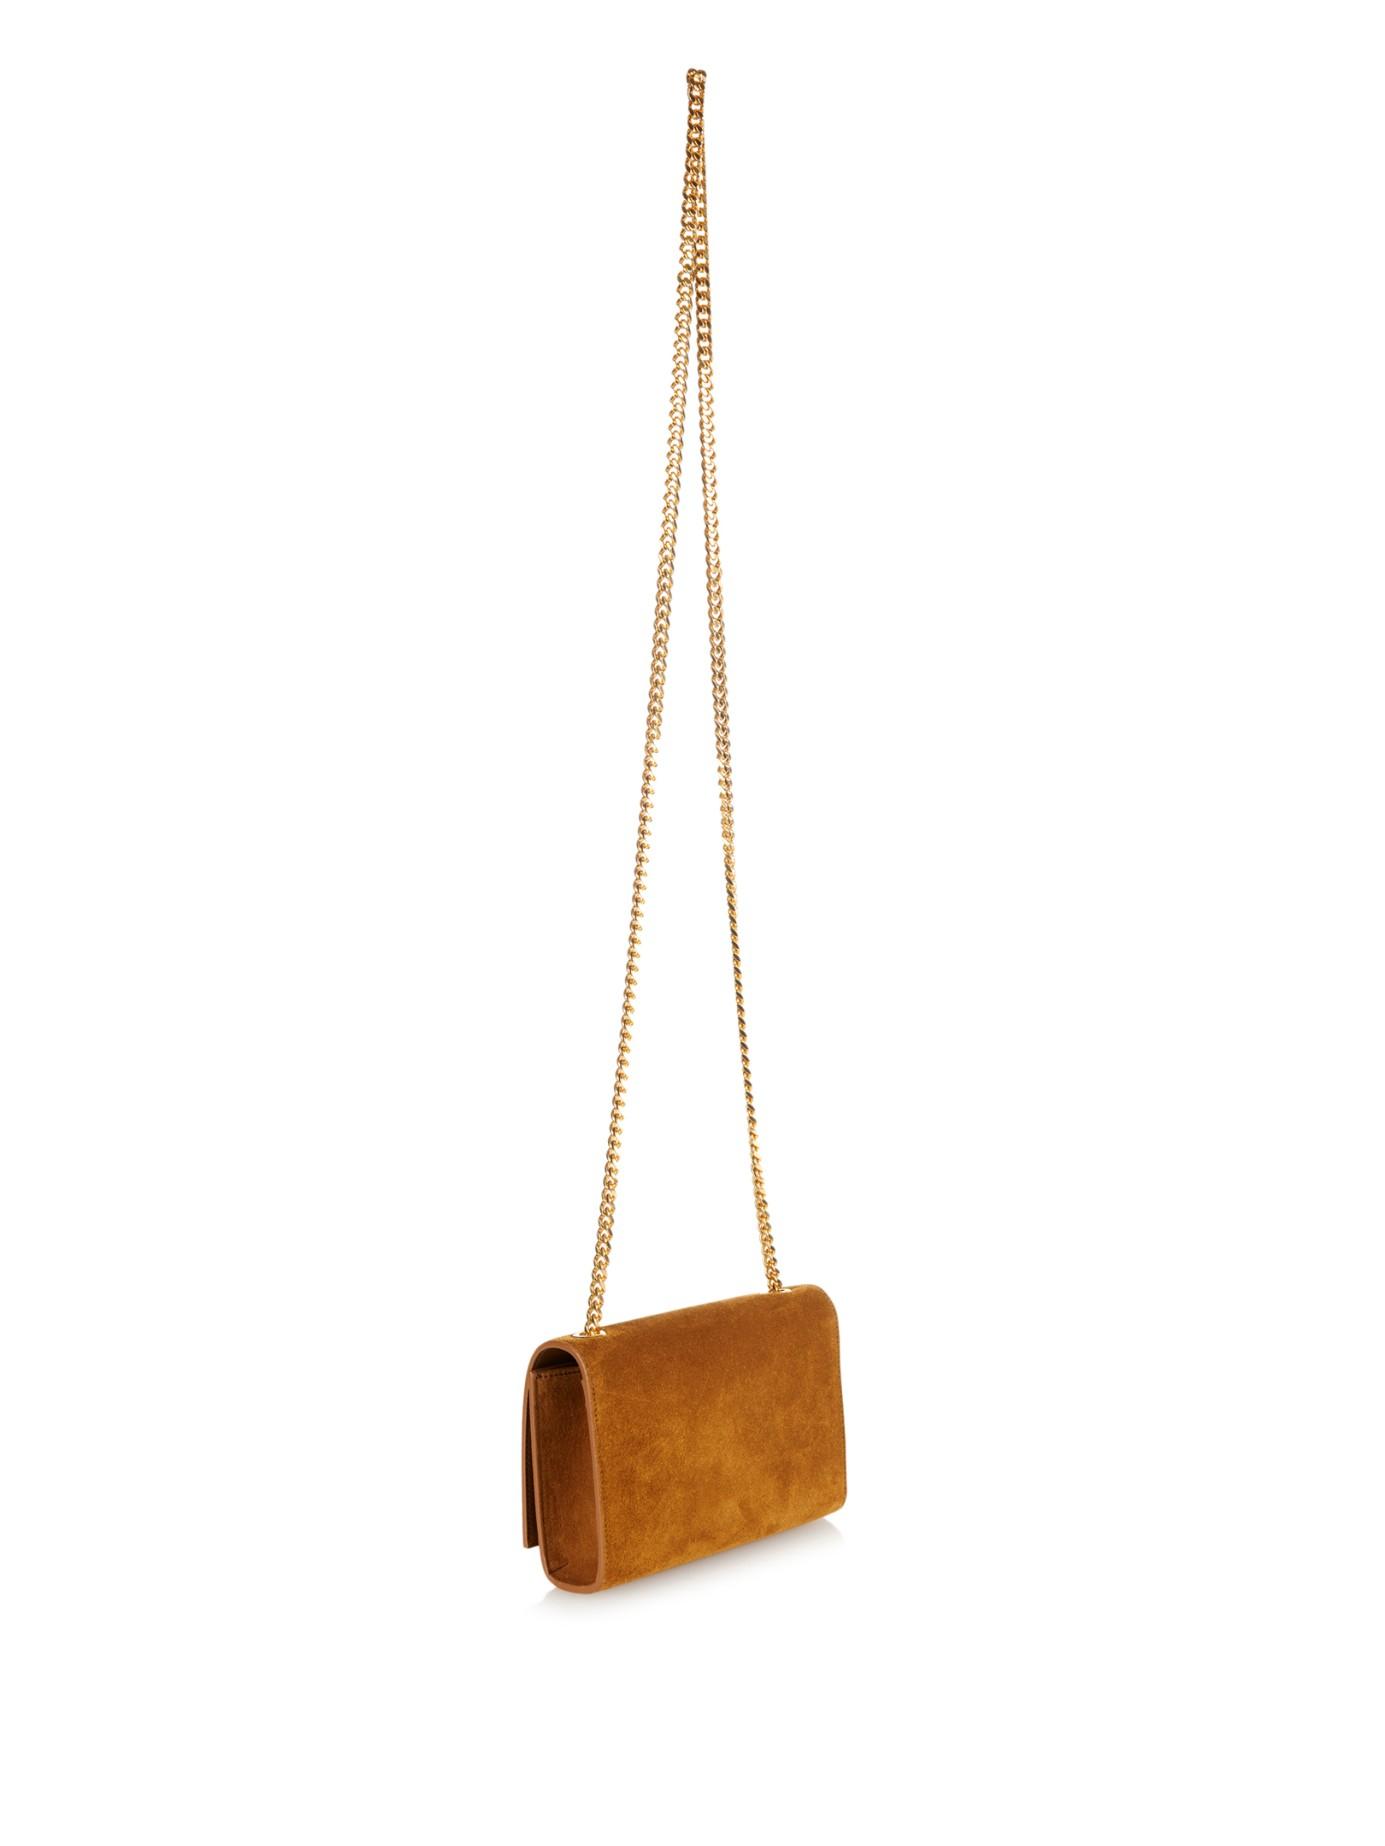 Monogram Small Zip-around Satchel Bag, Bordeaux